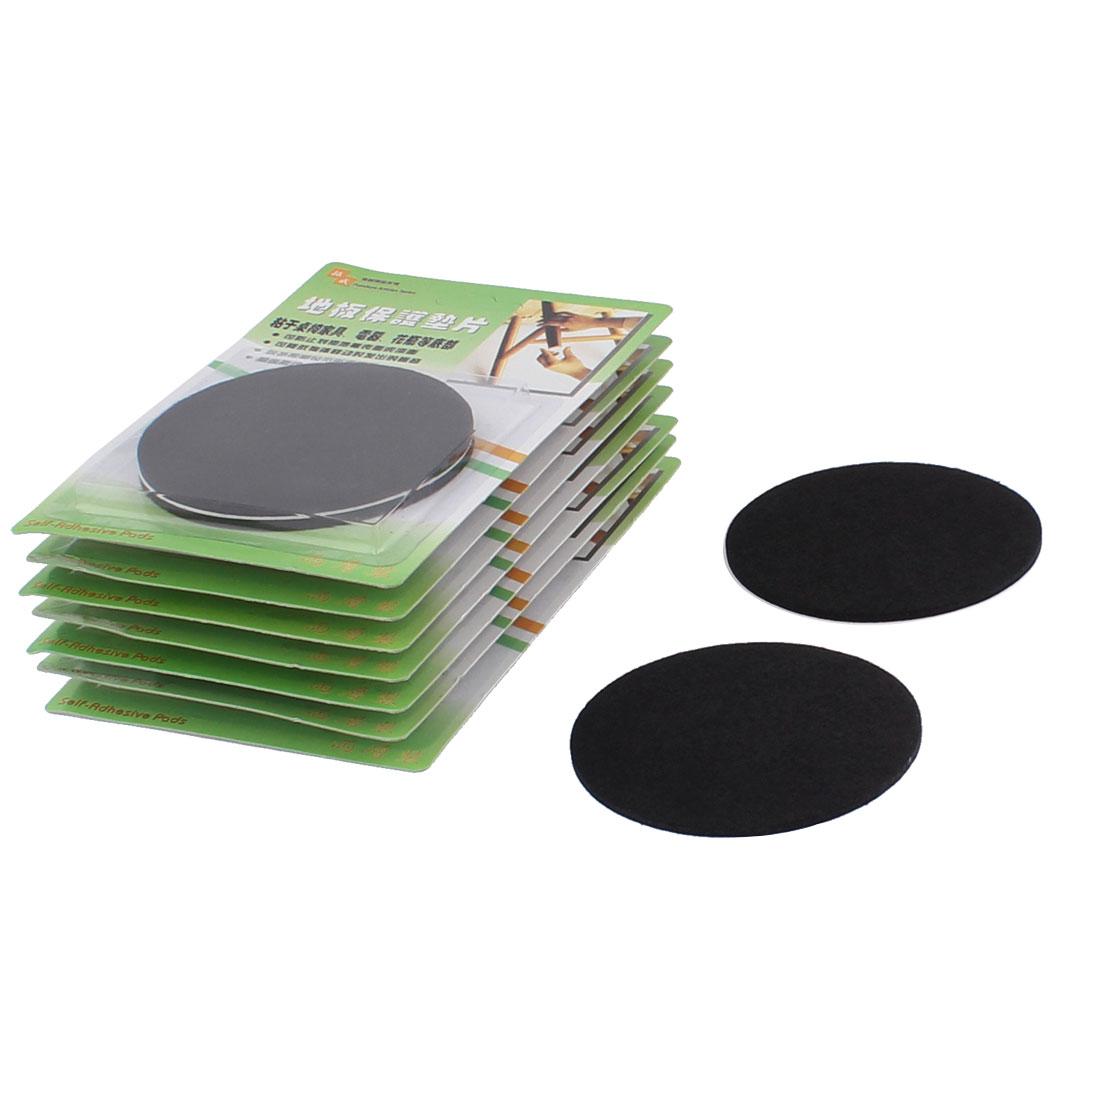 Cabinet Desk Legs Self Adhesive Floor Protection Furniture Felt Pads Mats Black 85mm Diameter 16pcs